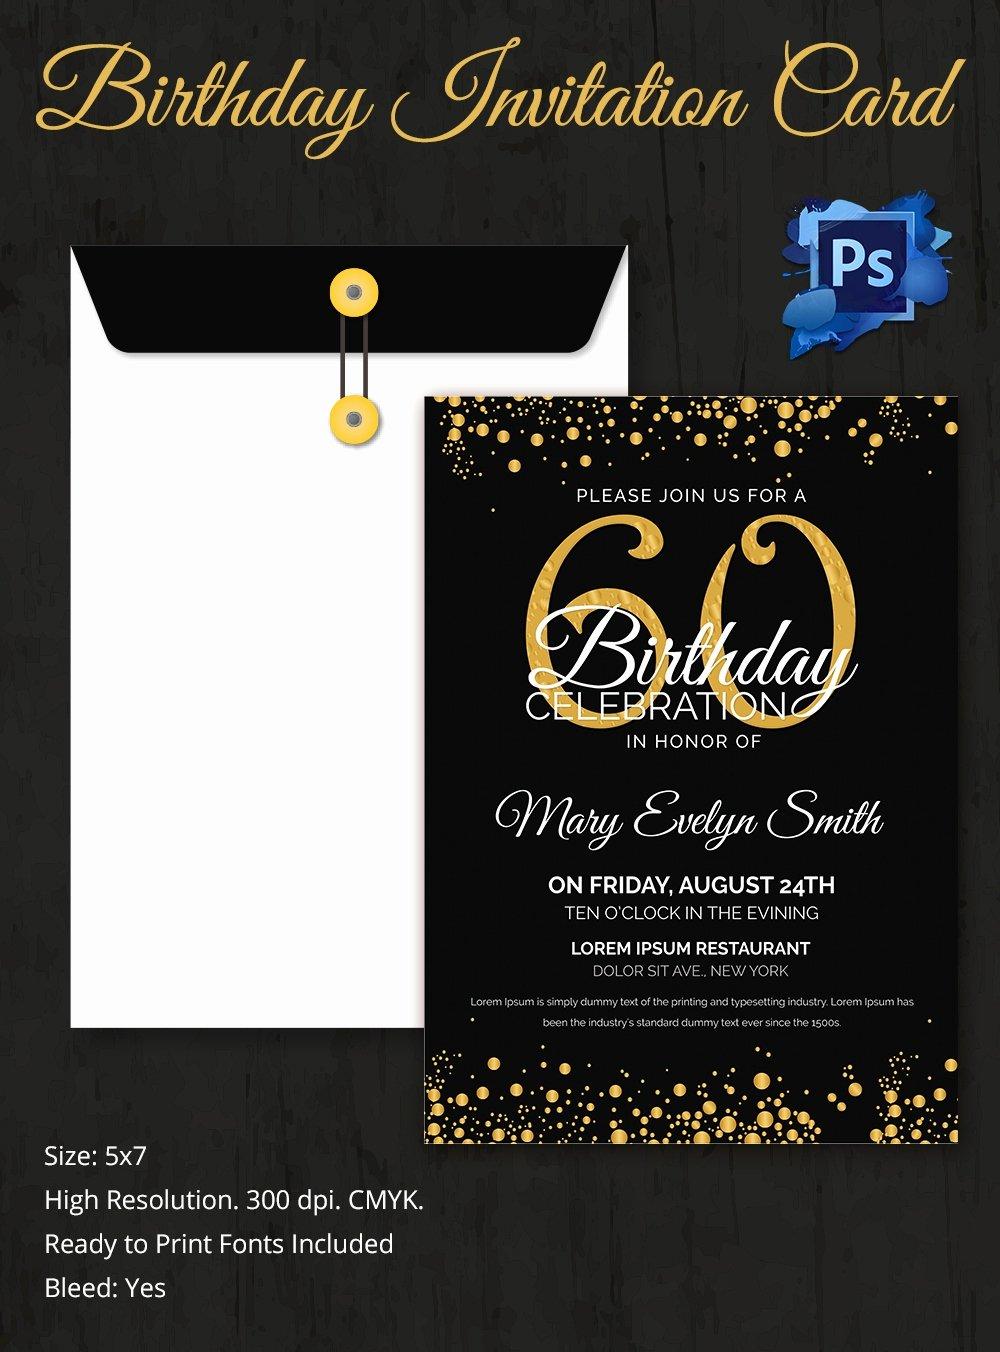 Birthday Invitation Templates Word Unique Birthday Invitation Template 32 Free Word Pdf Psd Ai